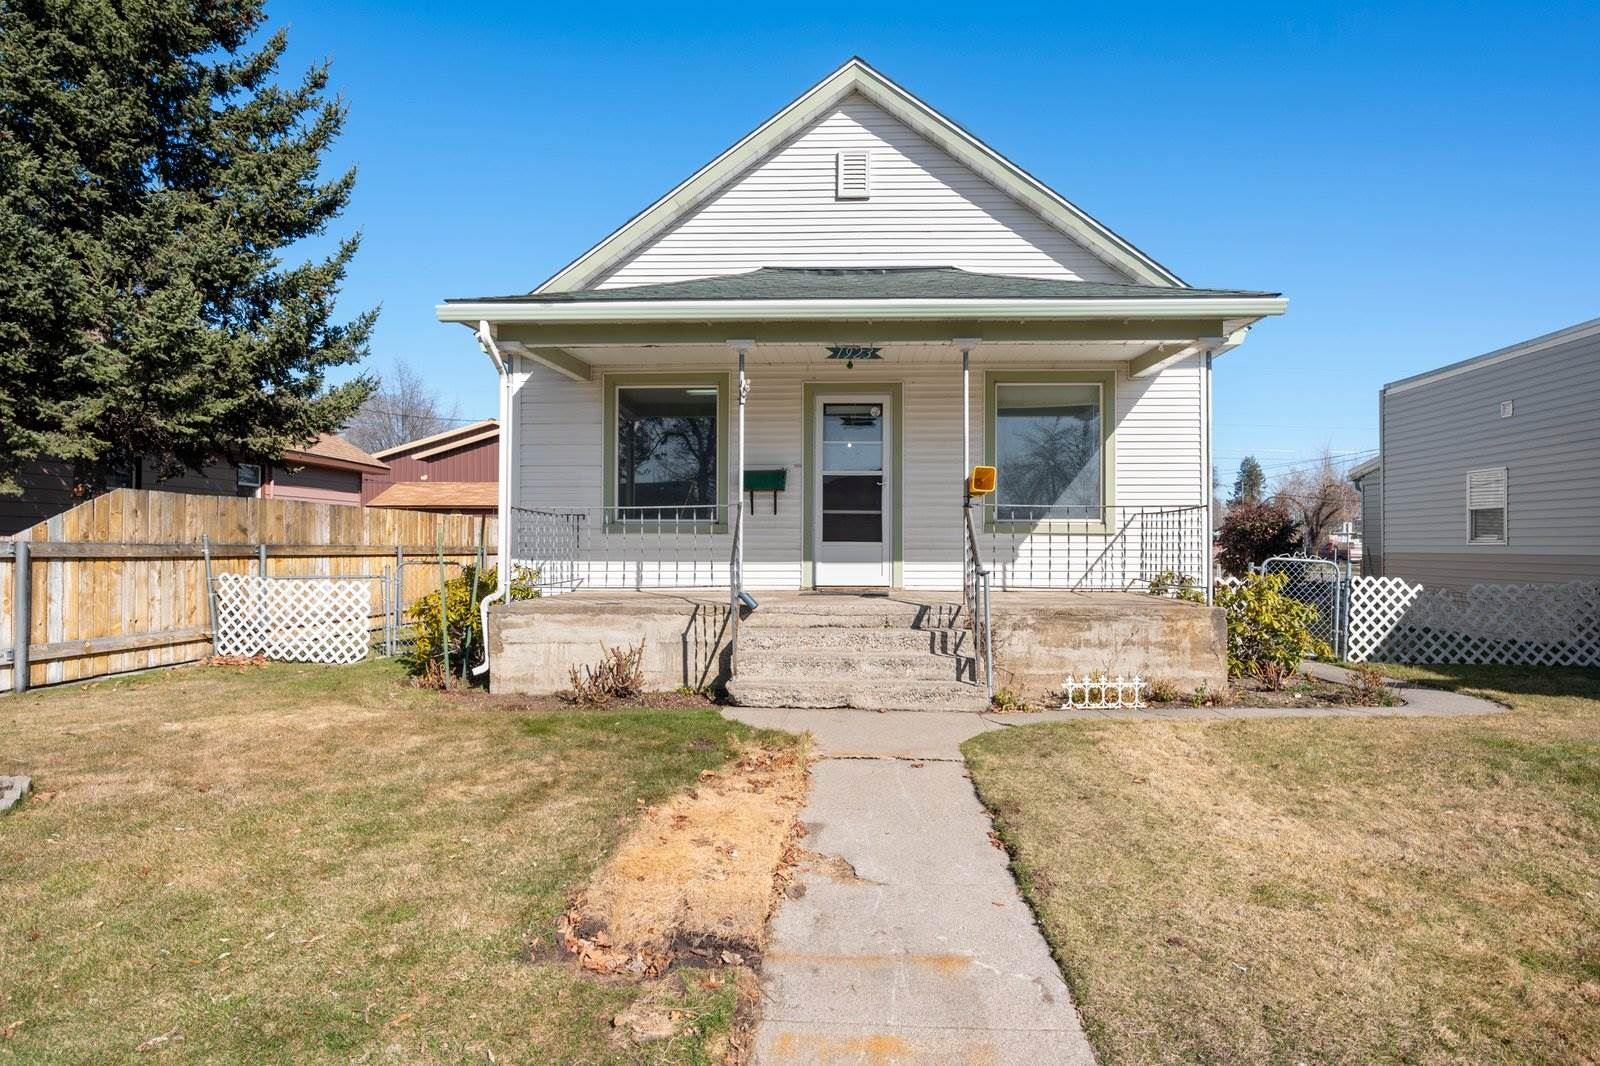 1923 E Boone Ave, Spokane, WA 99202-2709 - #: 202112748